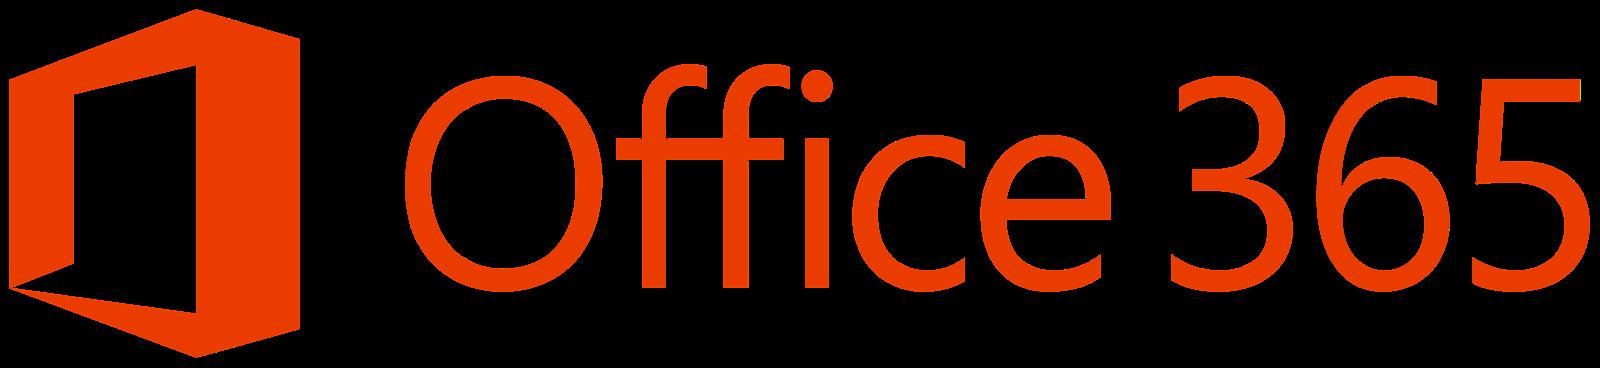 File:Office 365 logo.png